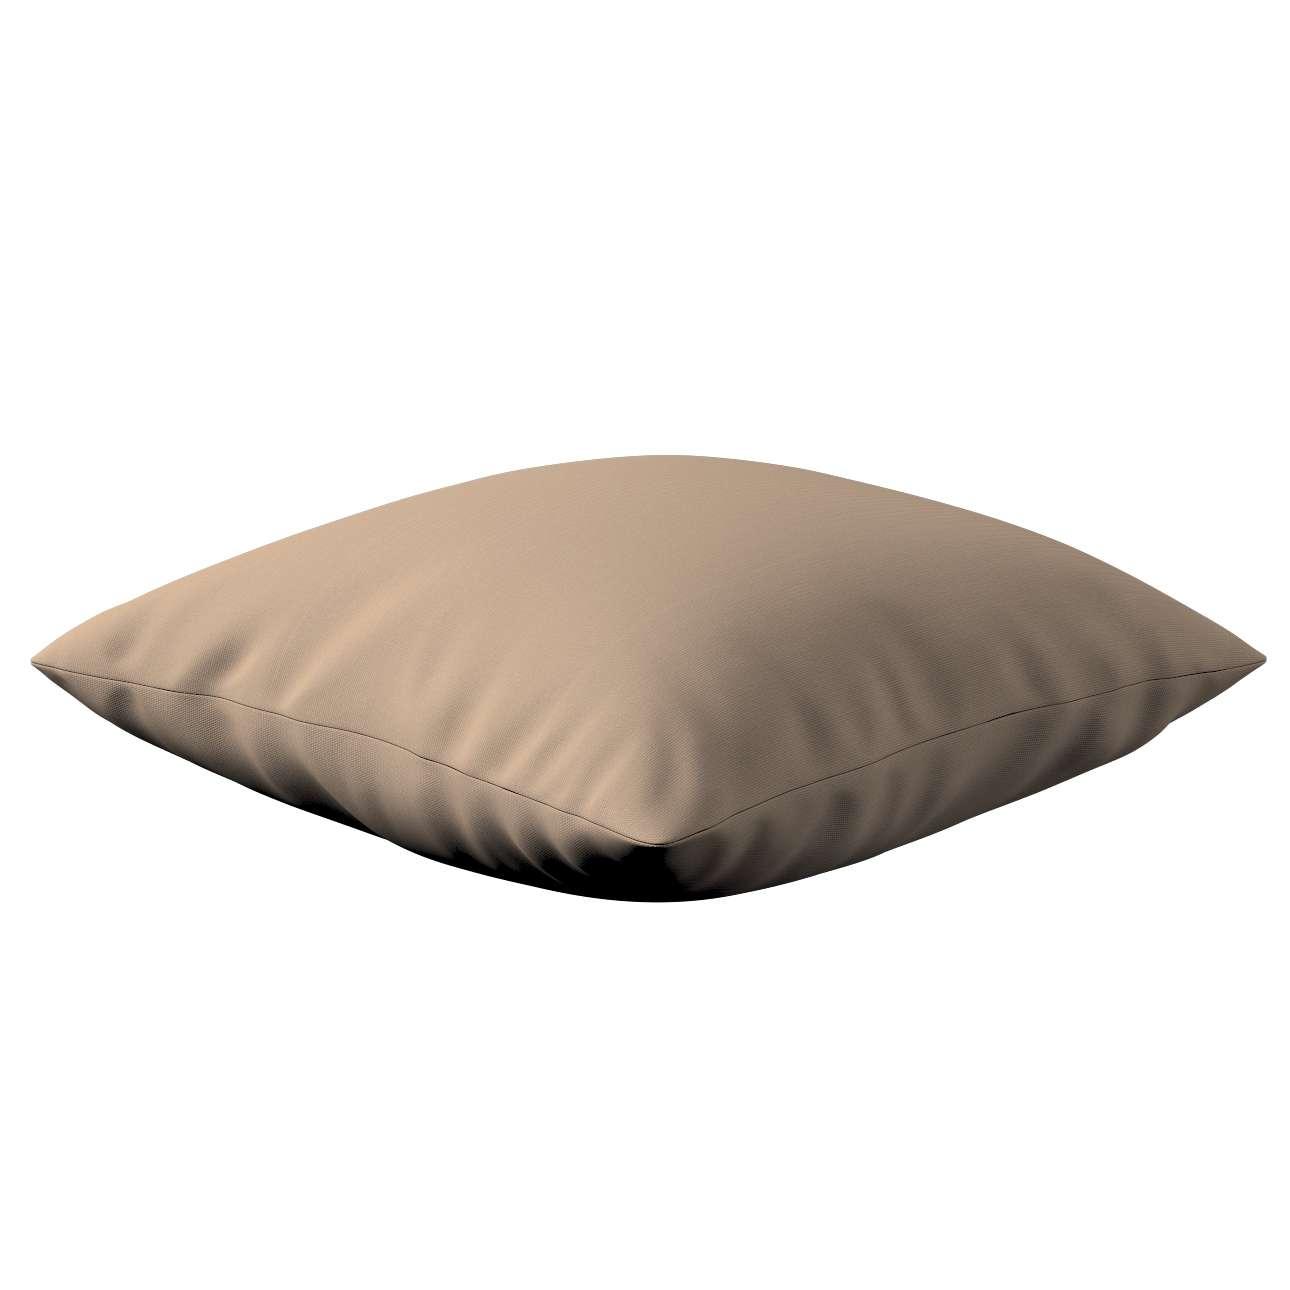 Kinga - potah na polštář jednoduchý v kolekci Cotton Panama, látka: 702-28